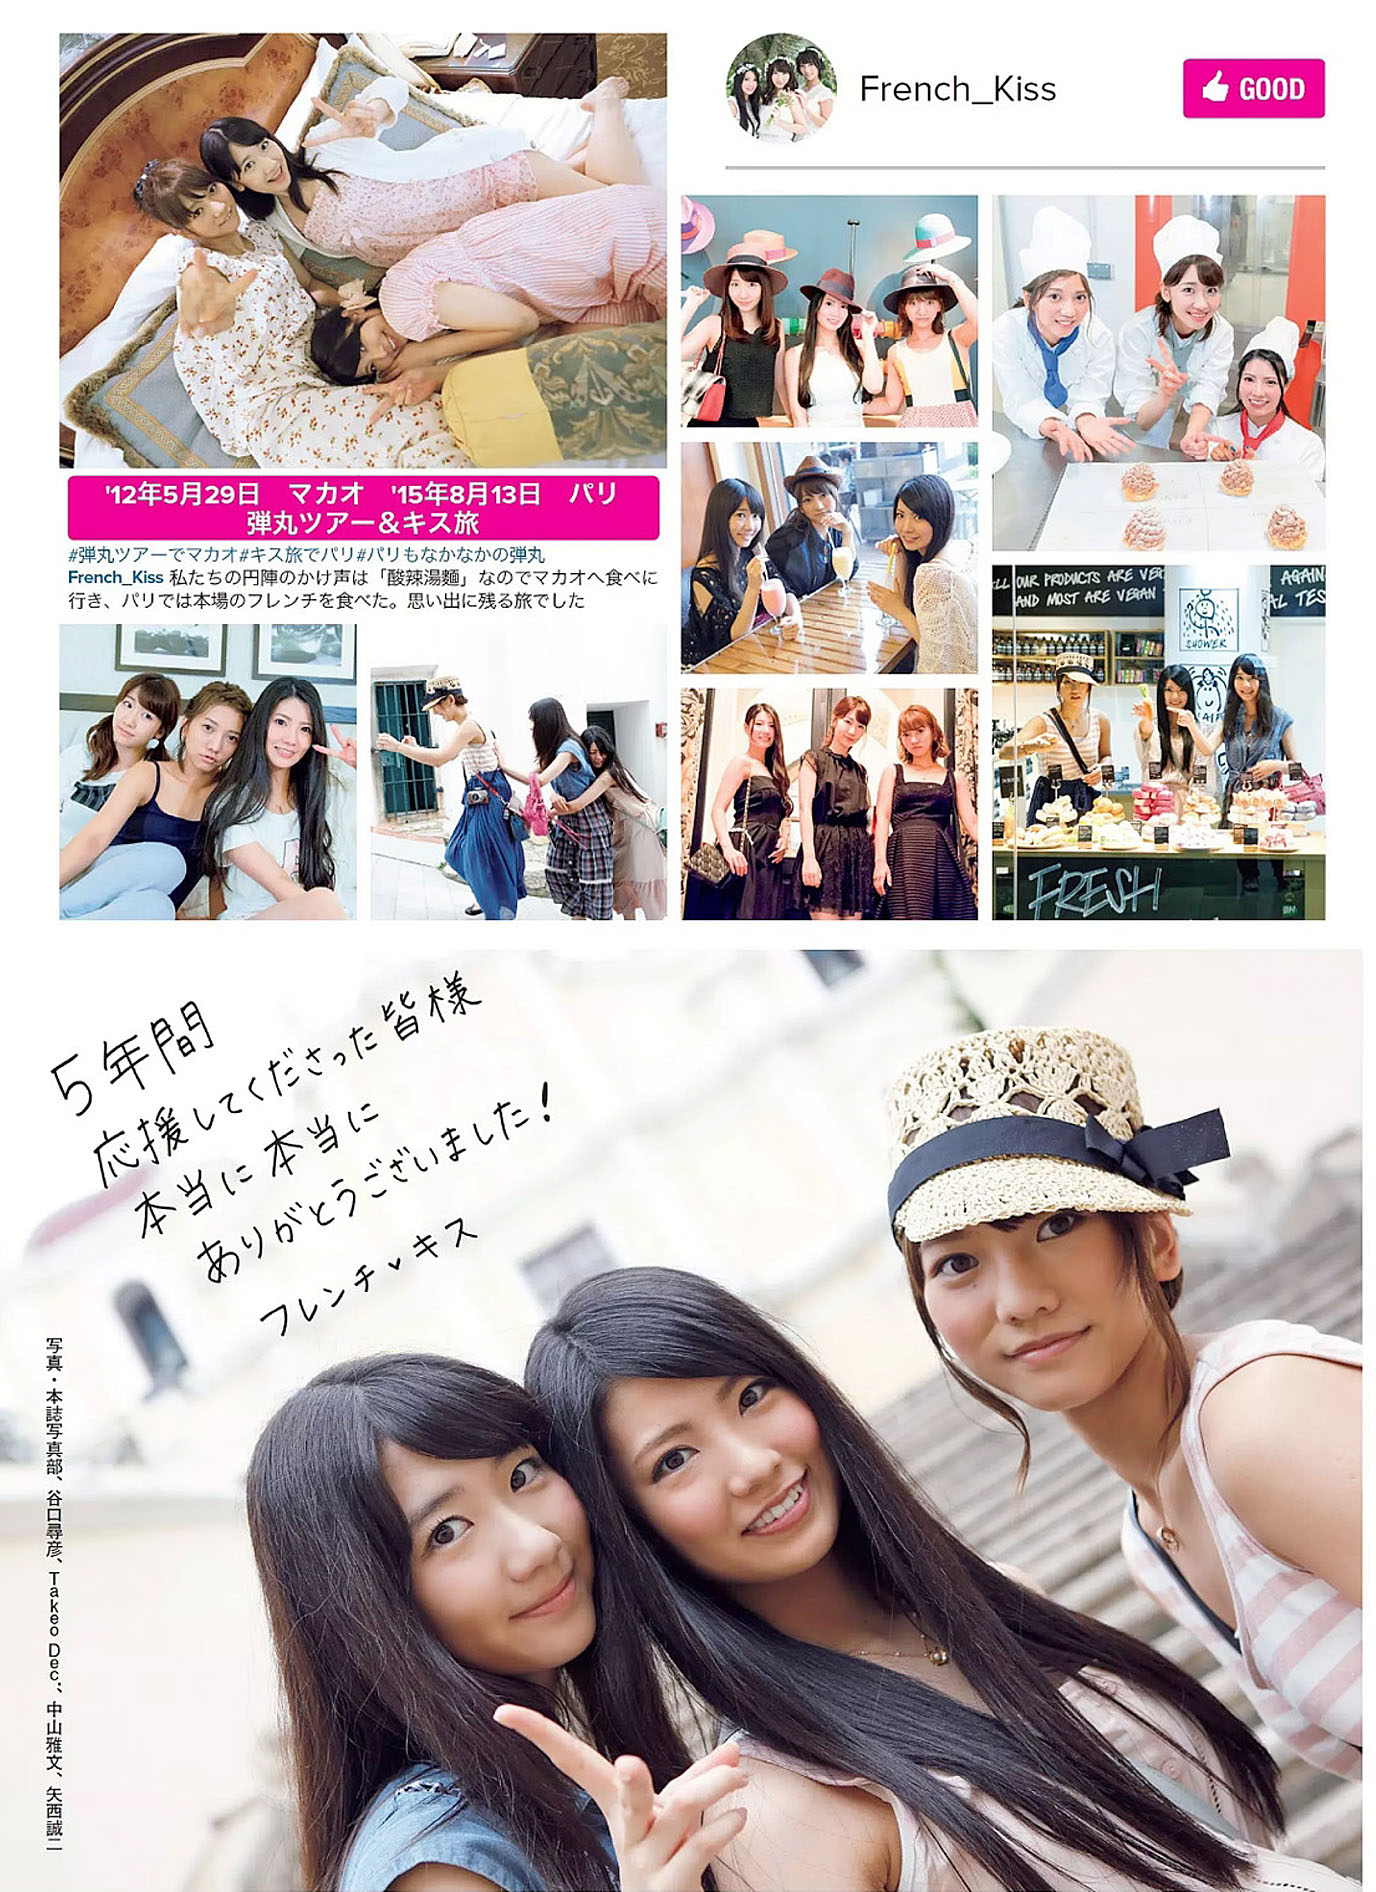 AKB48 French Kiss Flash 151124 13.jpg